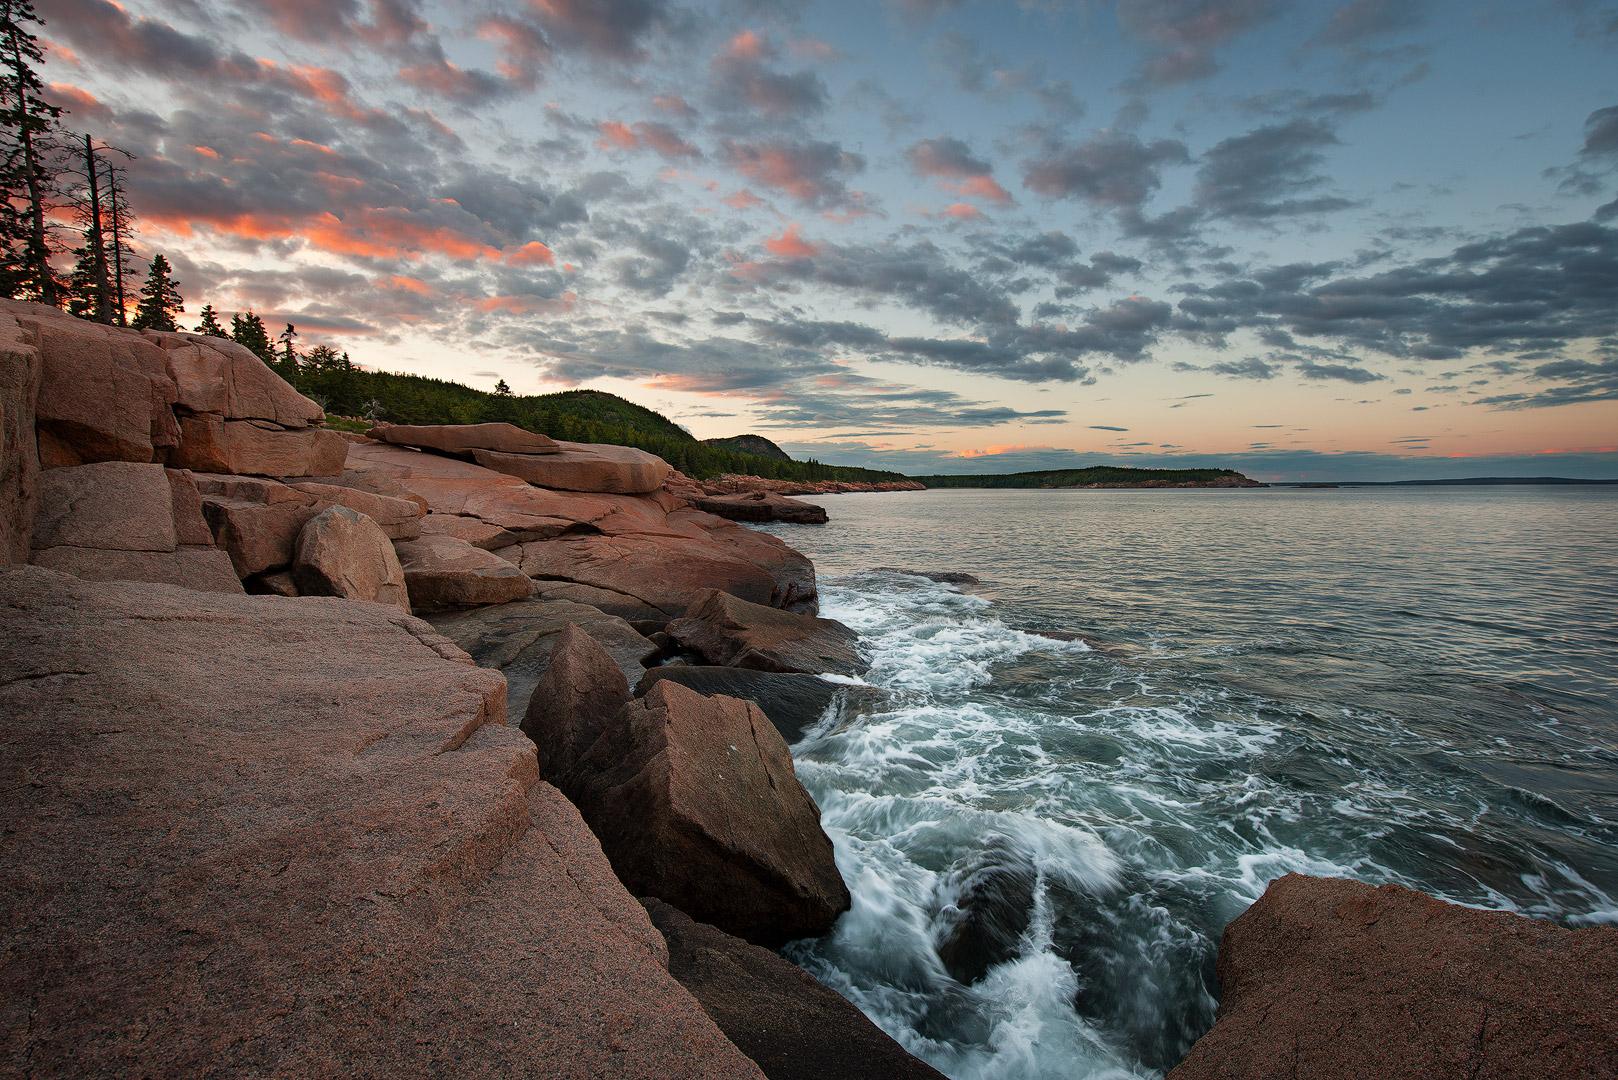 Atlantic, ocean, acadia, national, park, beach, island, bernard chen, timescapes, bass harbor, lighthouse, Mount Desert Island, sunset, dramatic skies, photo